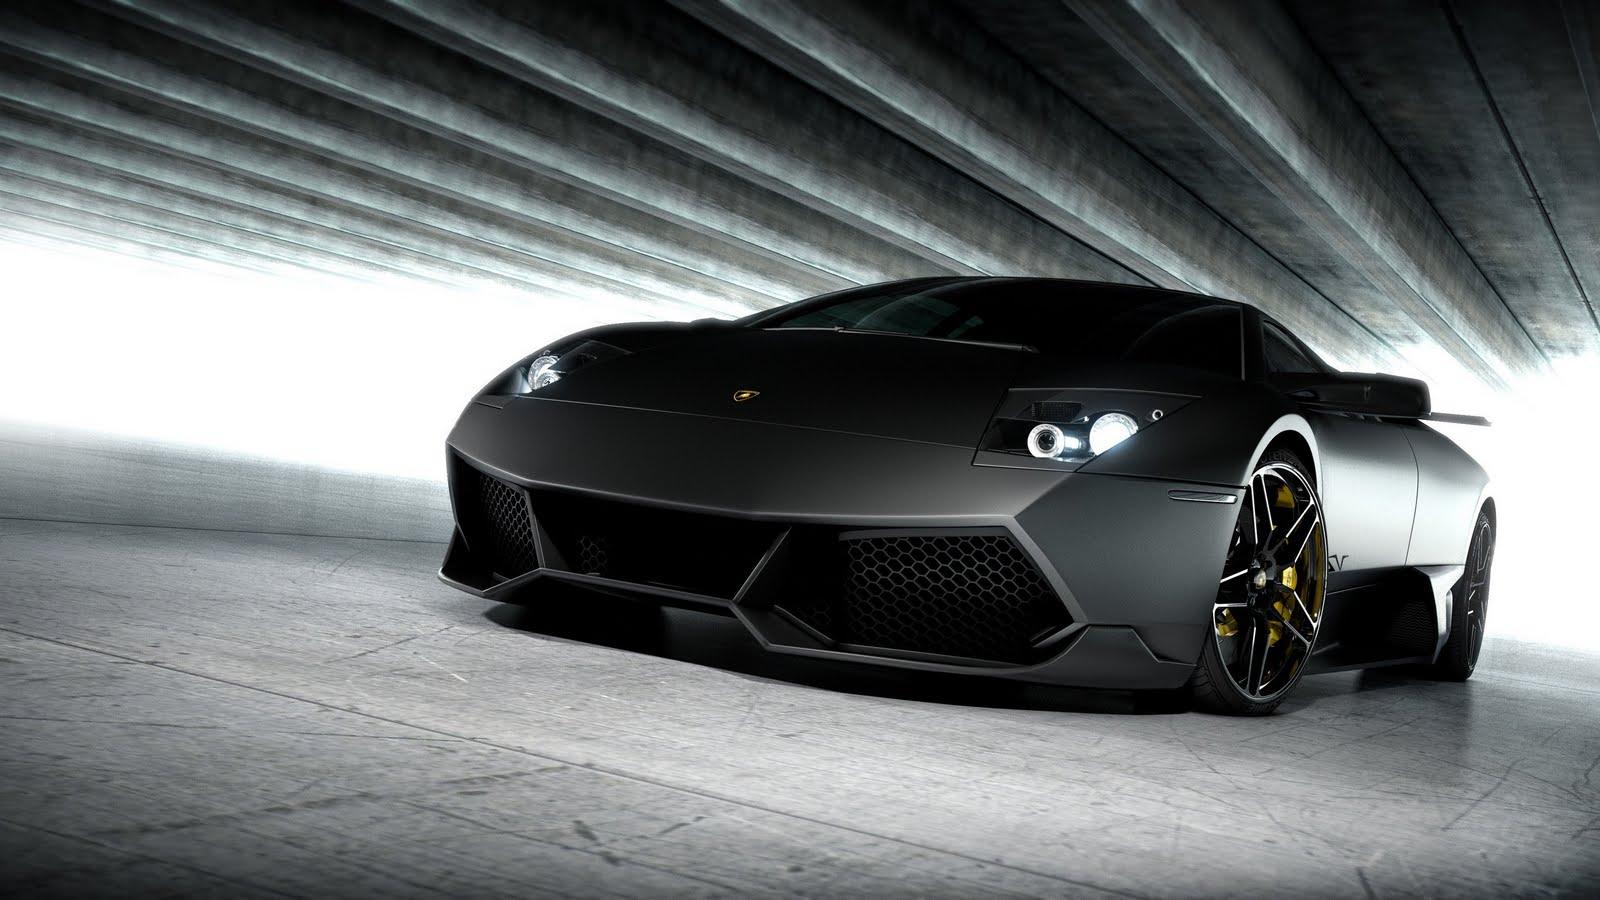 cool car 1